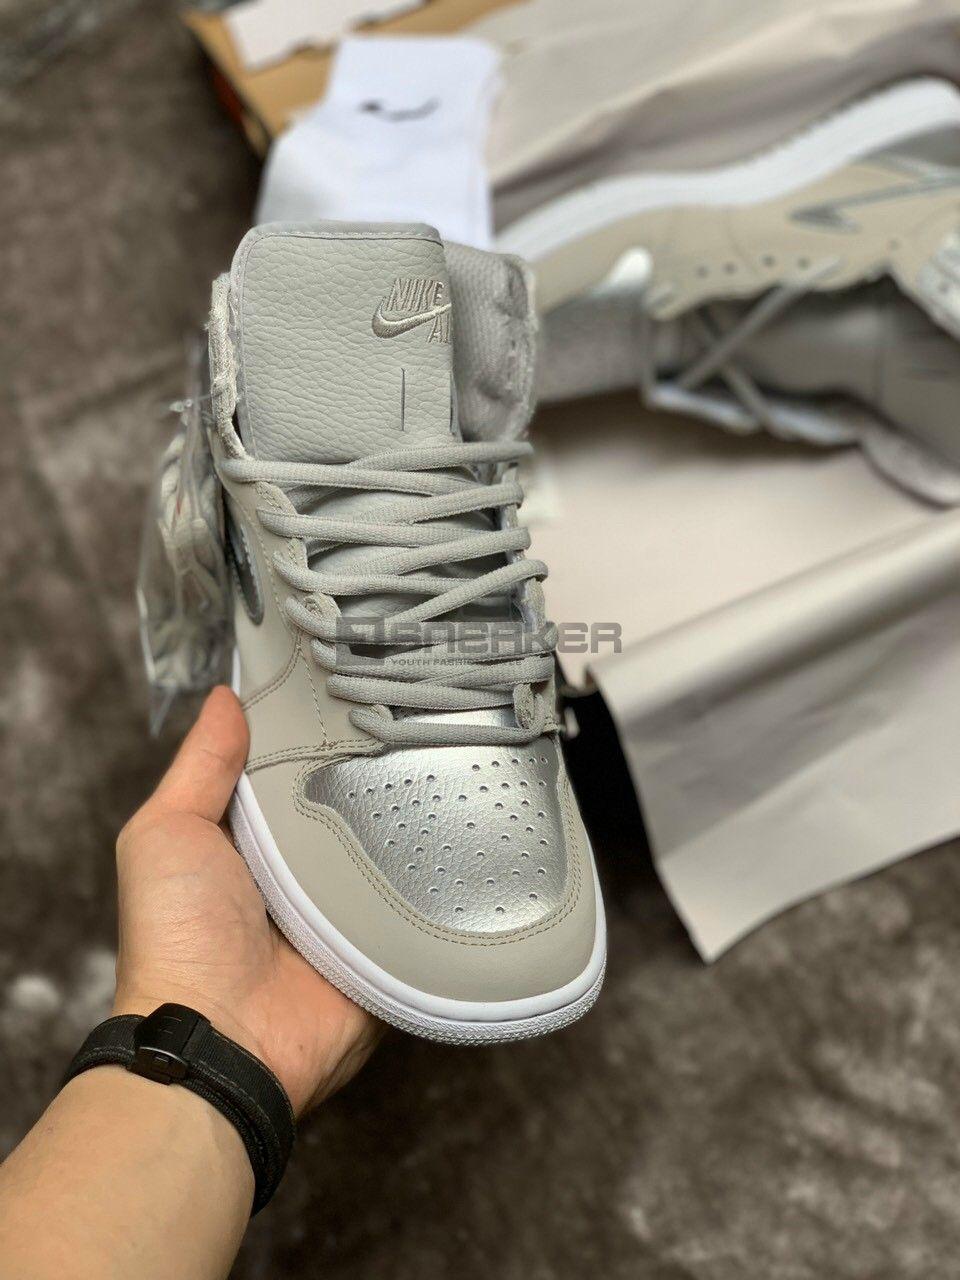 Nike Air Jordan 1 Retro High CO Japan Neutral Grey